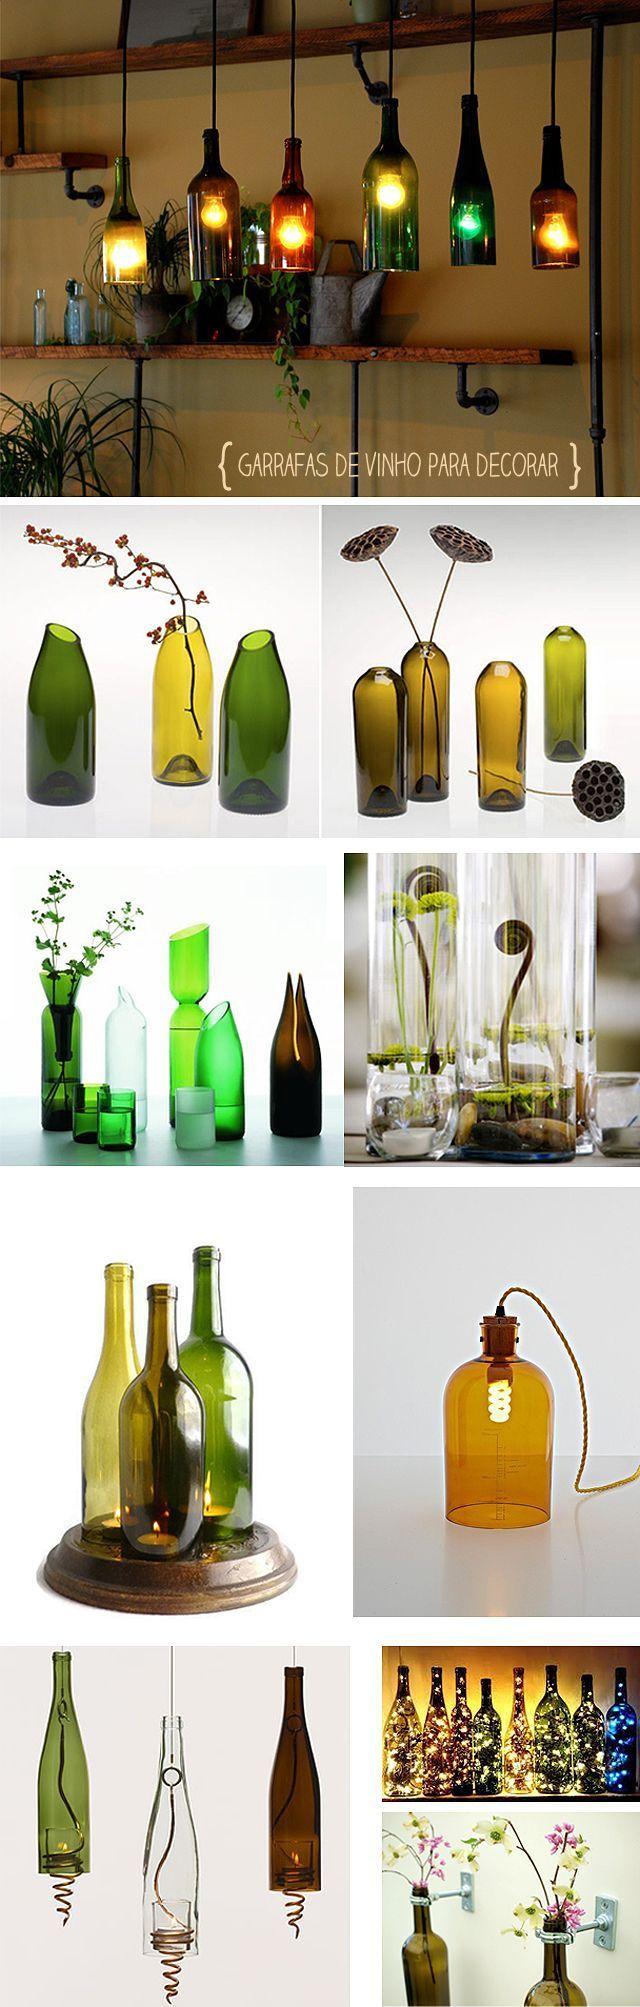 como deixar sua decoracao linda com garrafas decorativas is part of Bottles decoration - Como deixar sua decoração LINDA com garrafas decorativas Bottleart DIY